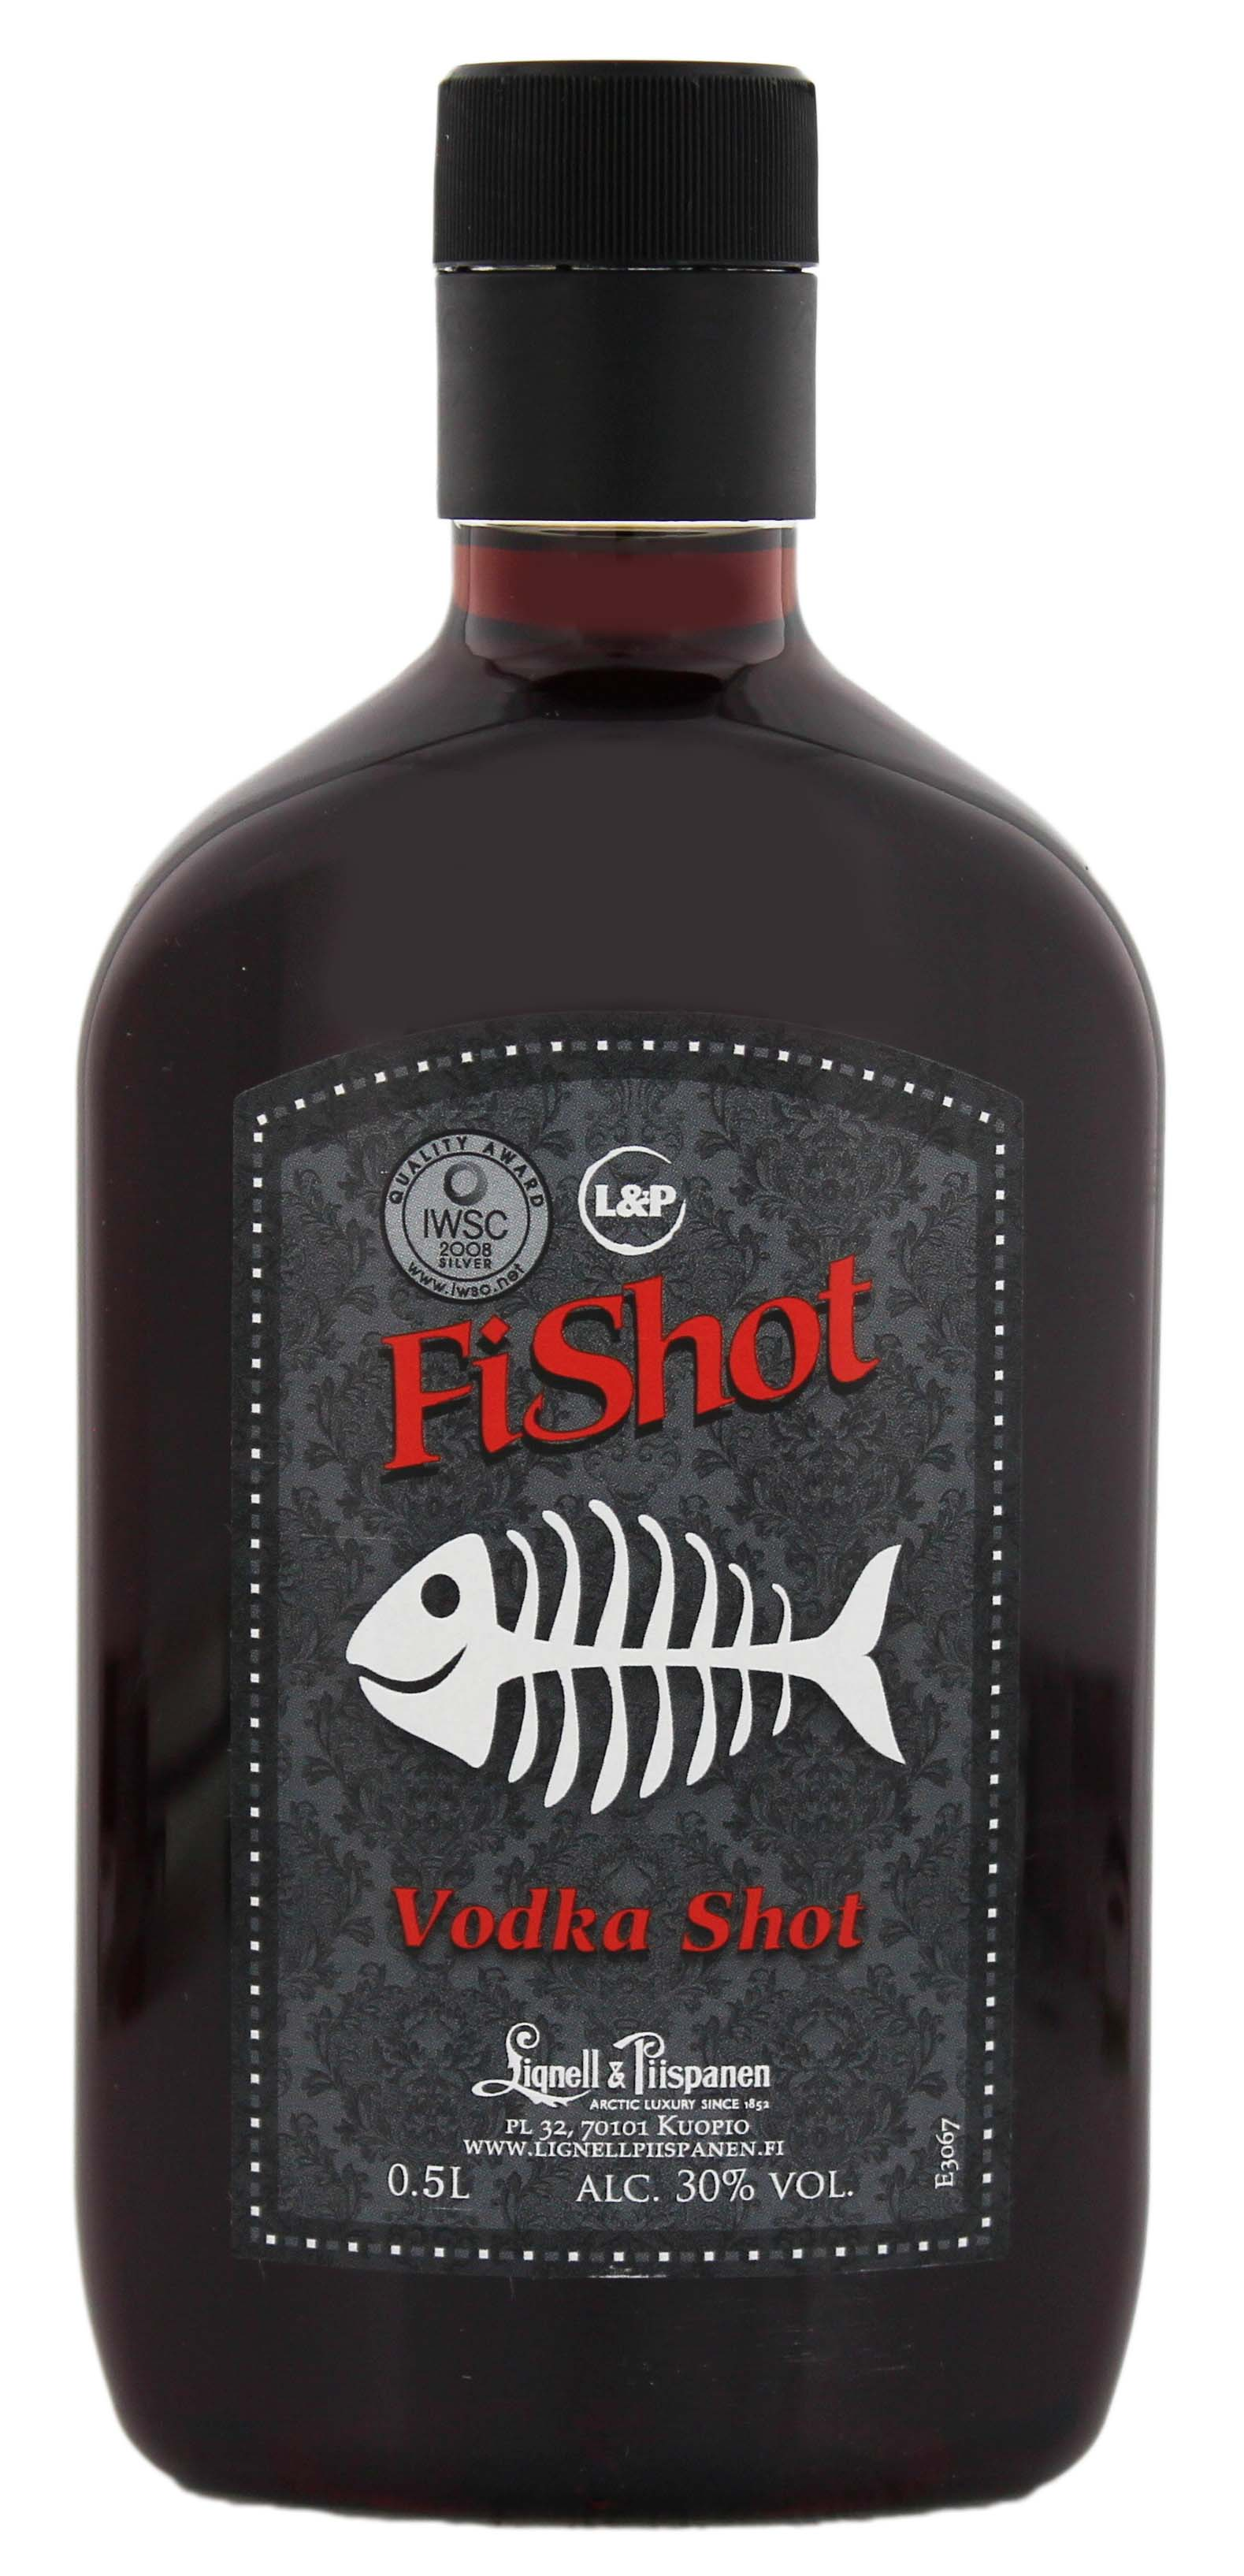 FiShot Vodka Shot 0,5L PET